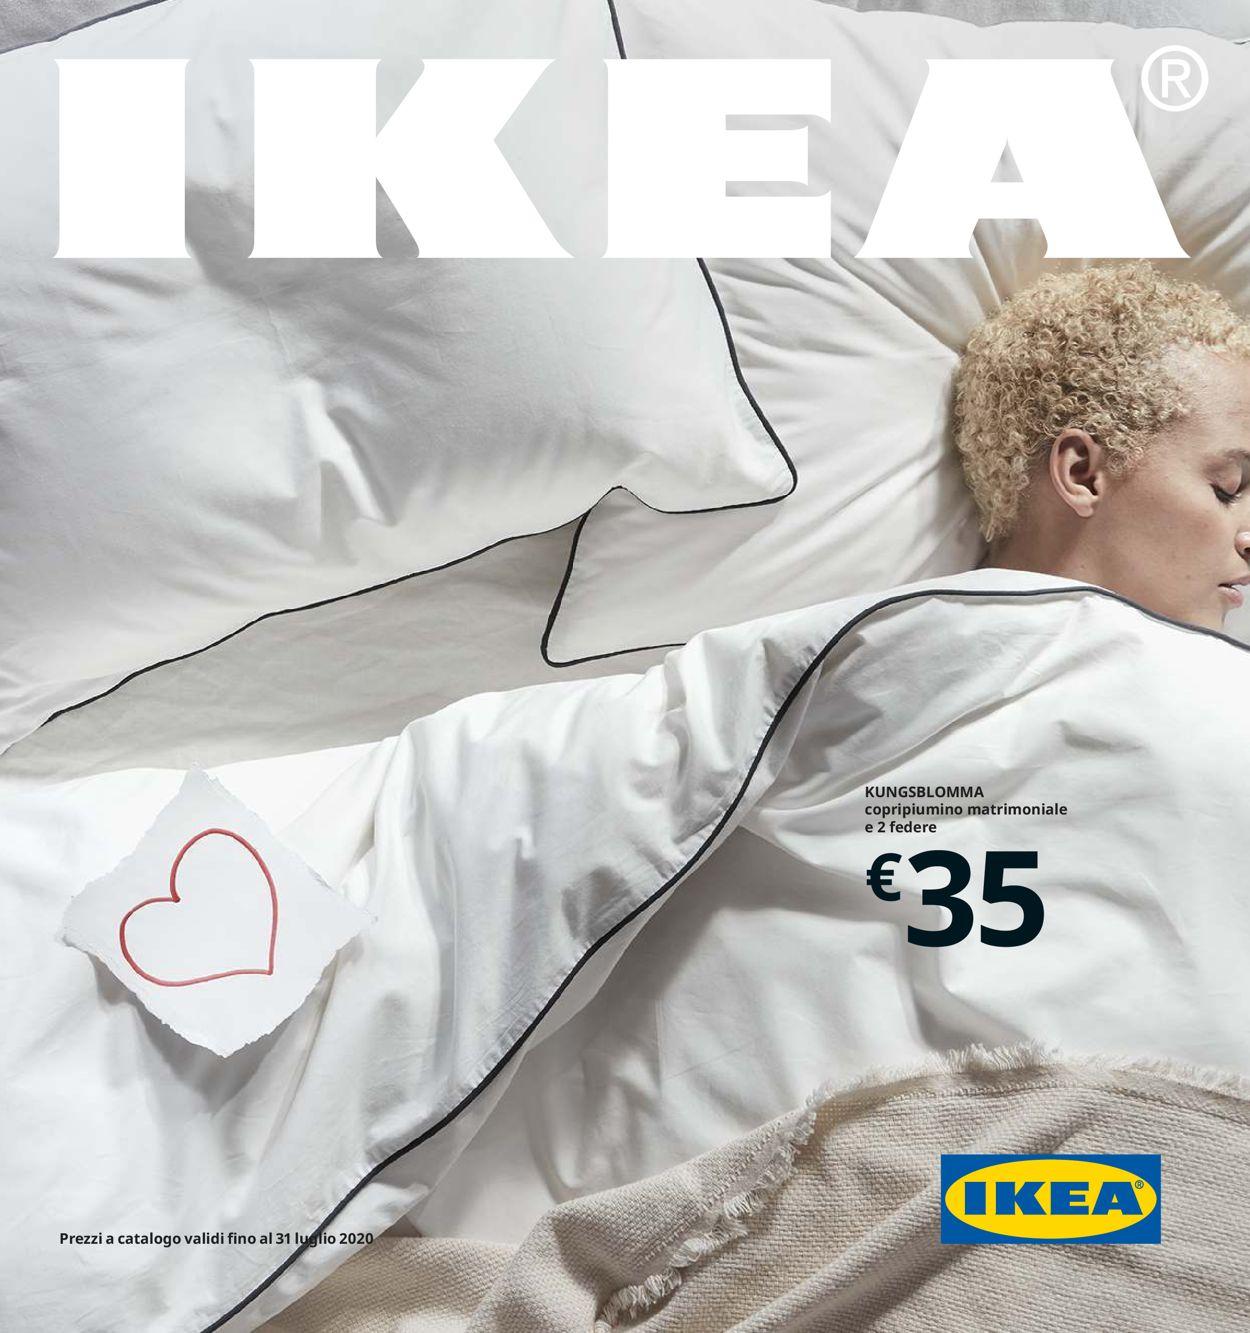 Volantino IKEA - Offerte 22/08-31/07/2020